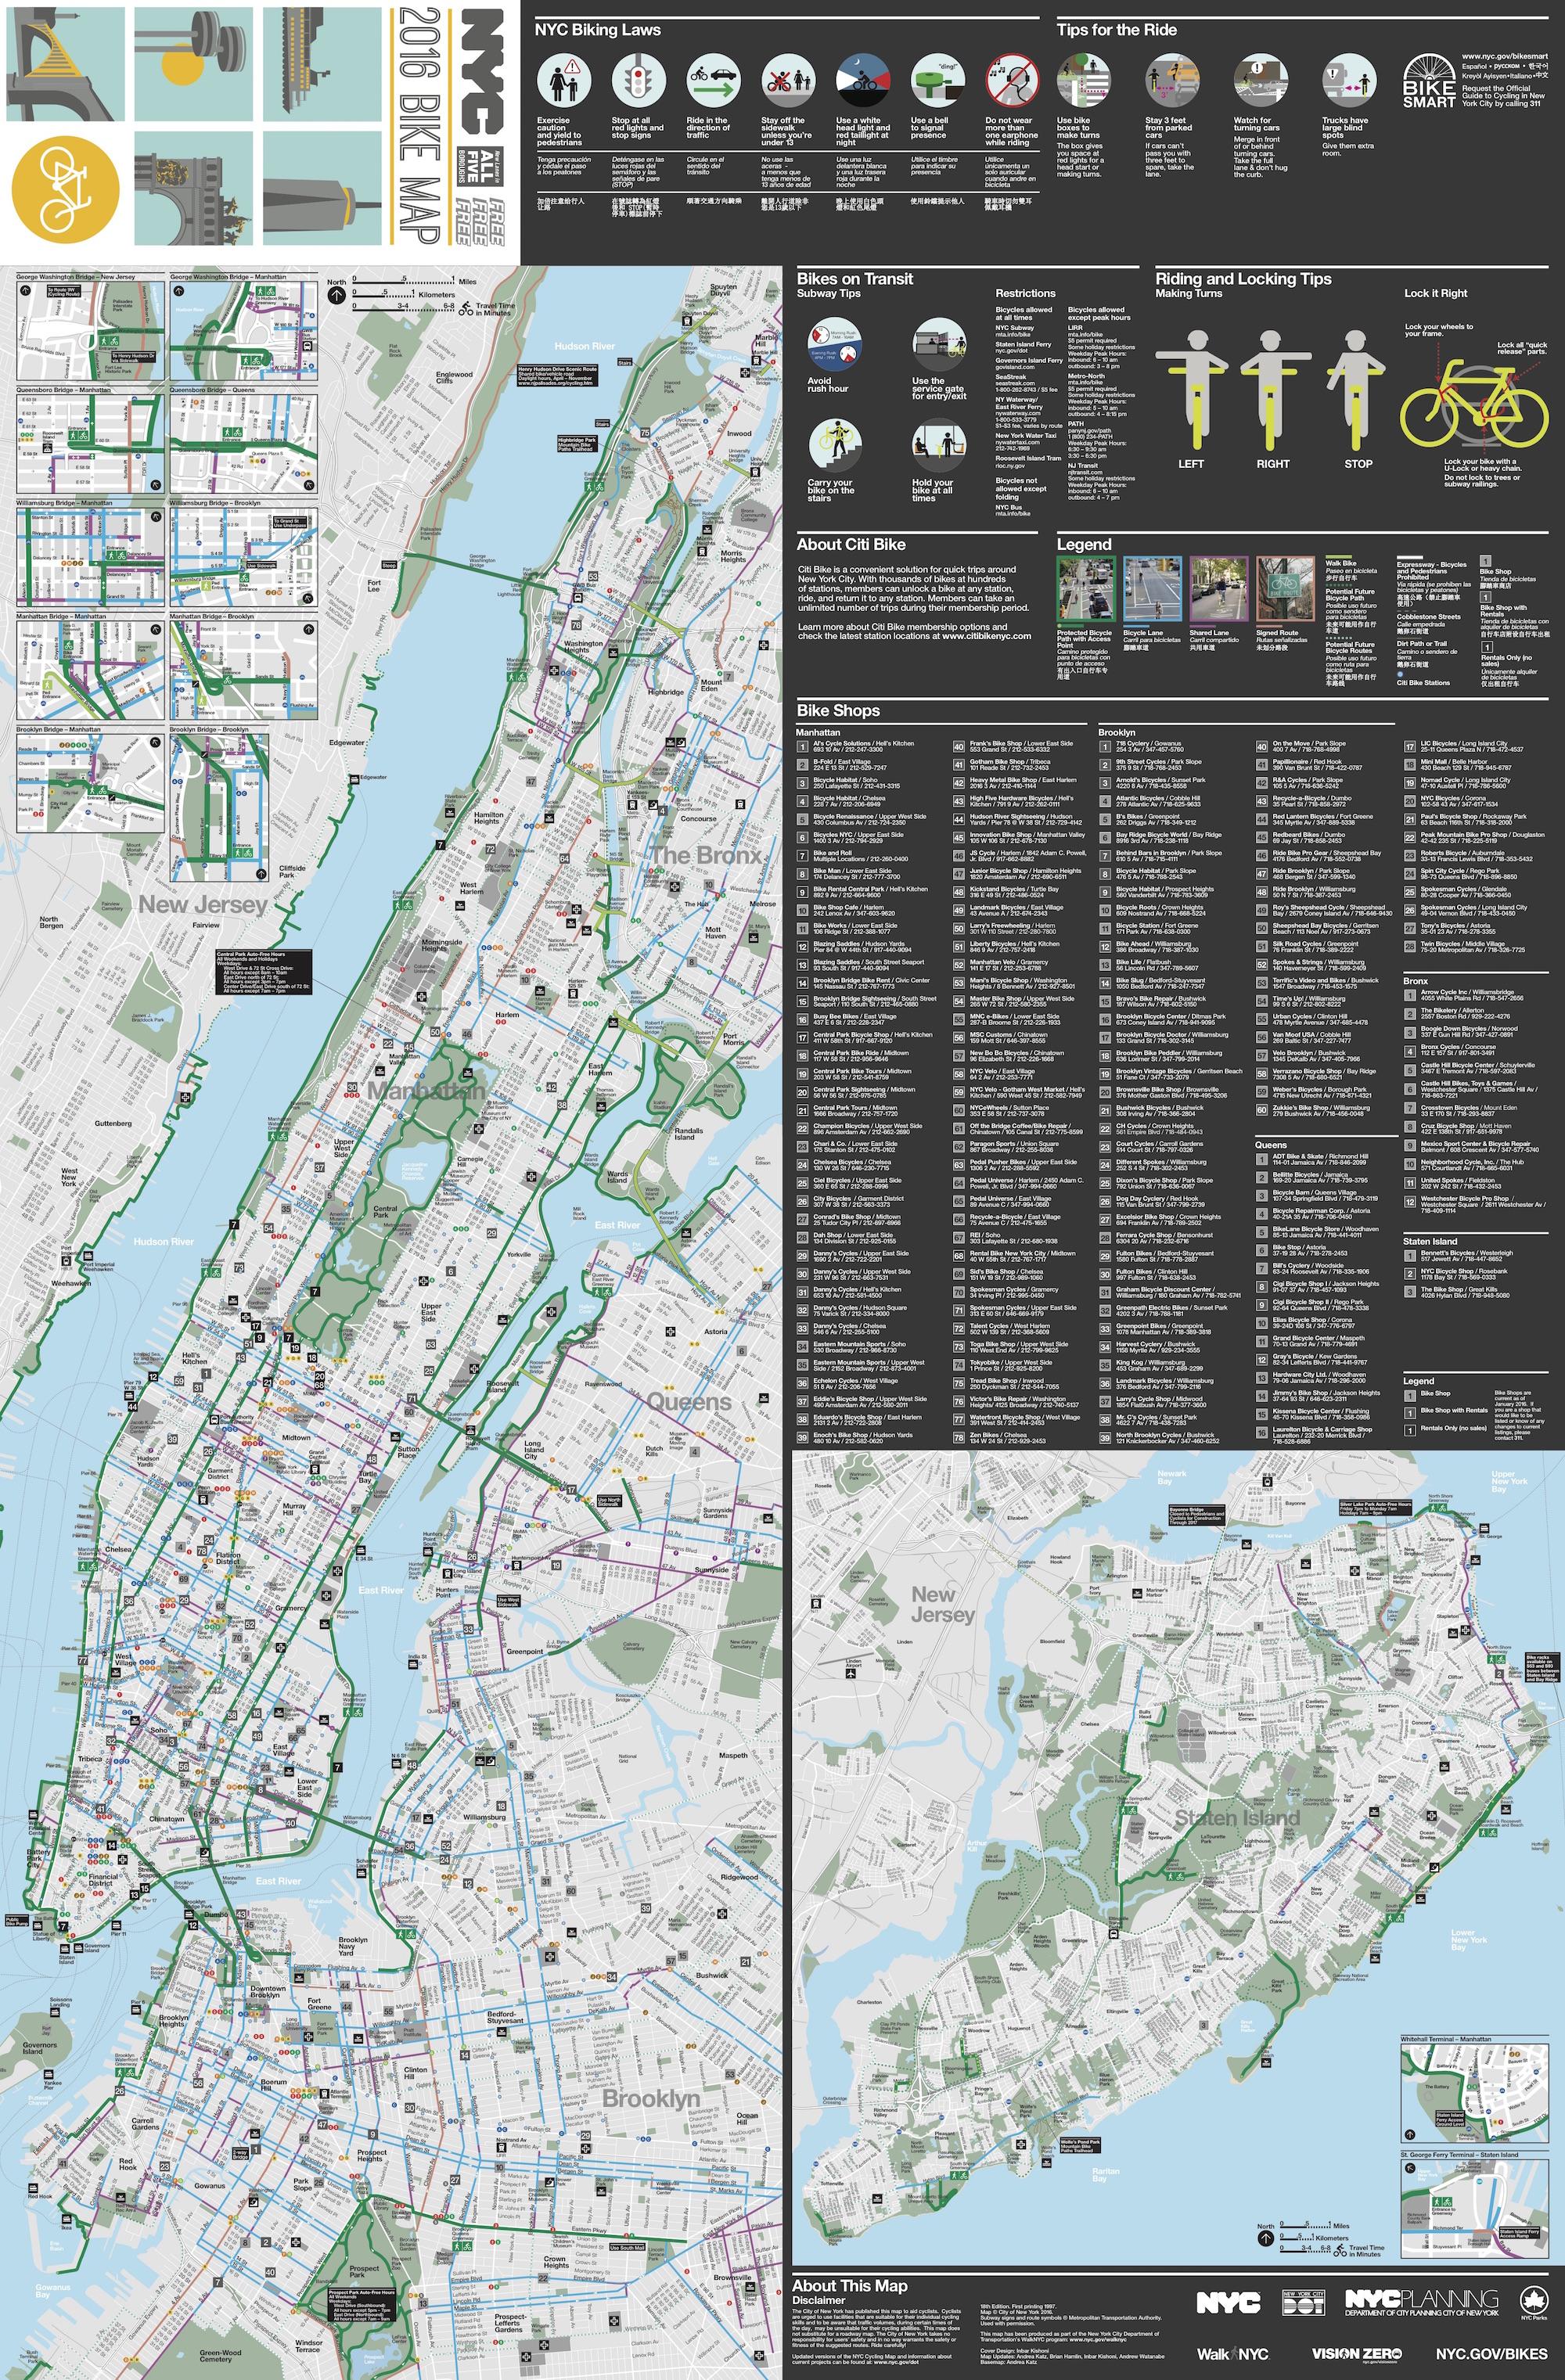 DOT, bike map, bike lanes, department of transportation, transportation,